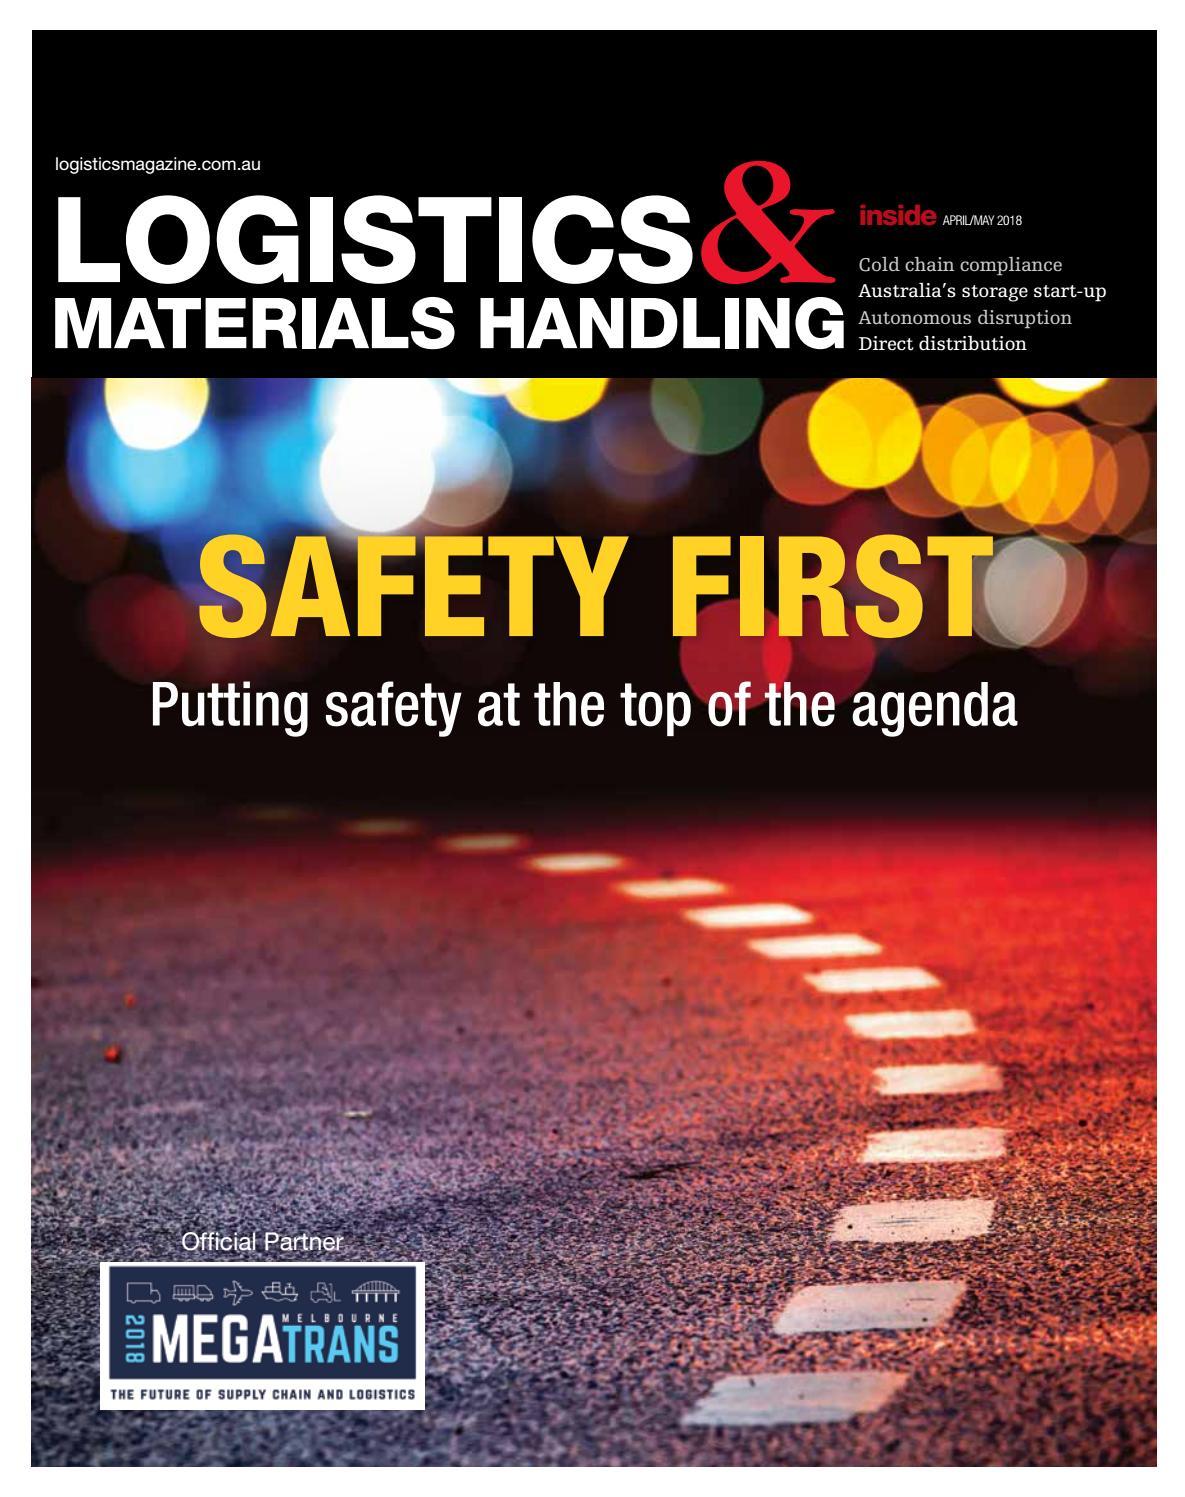 Logistics & Material Handling by PrimeCreative - issuu